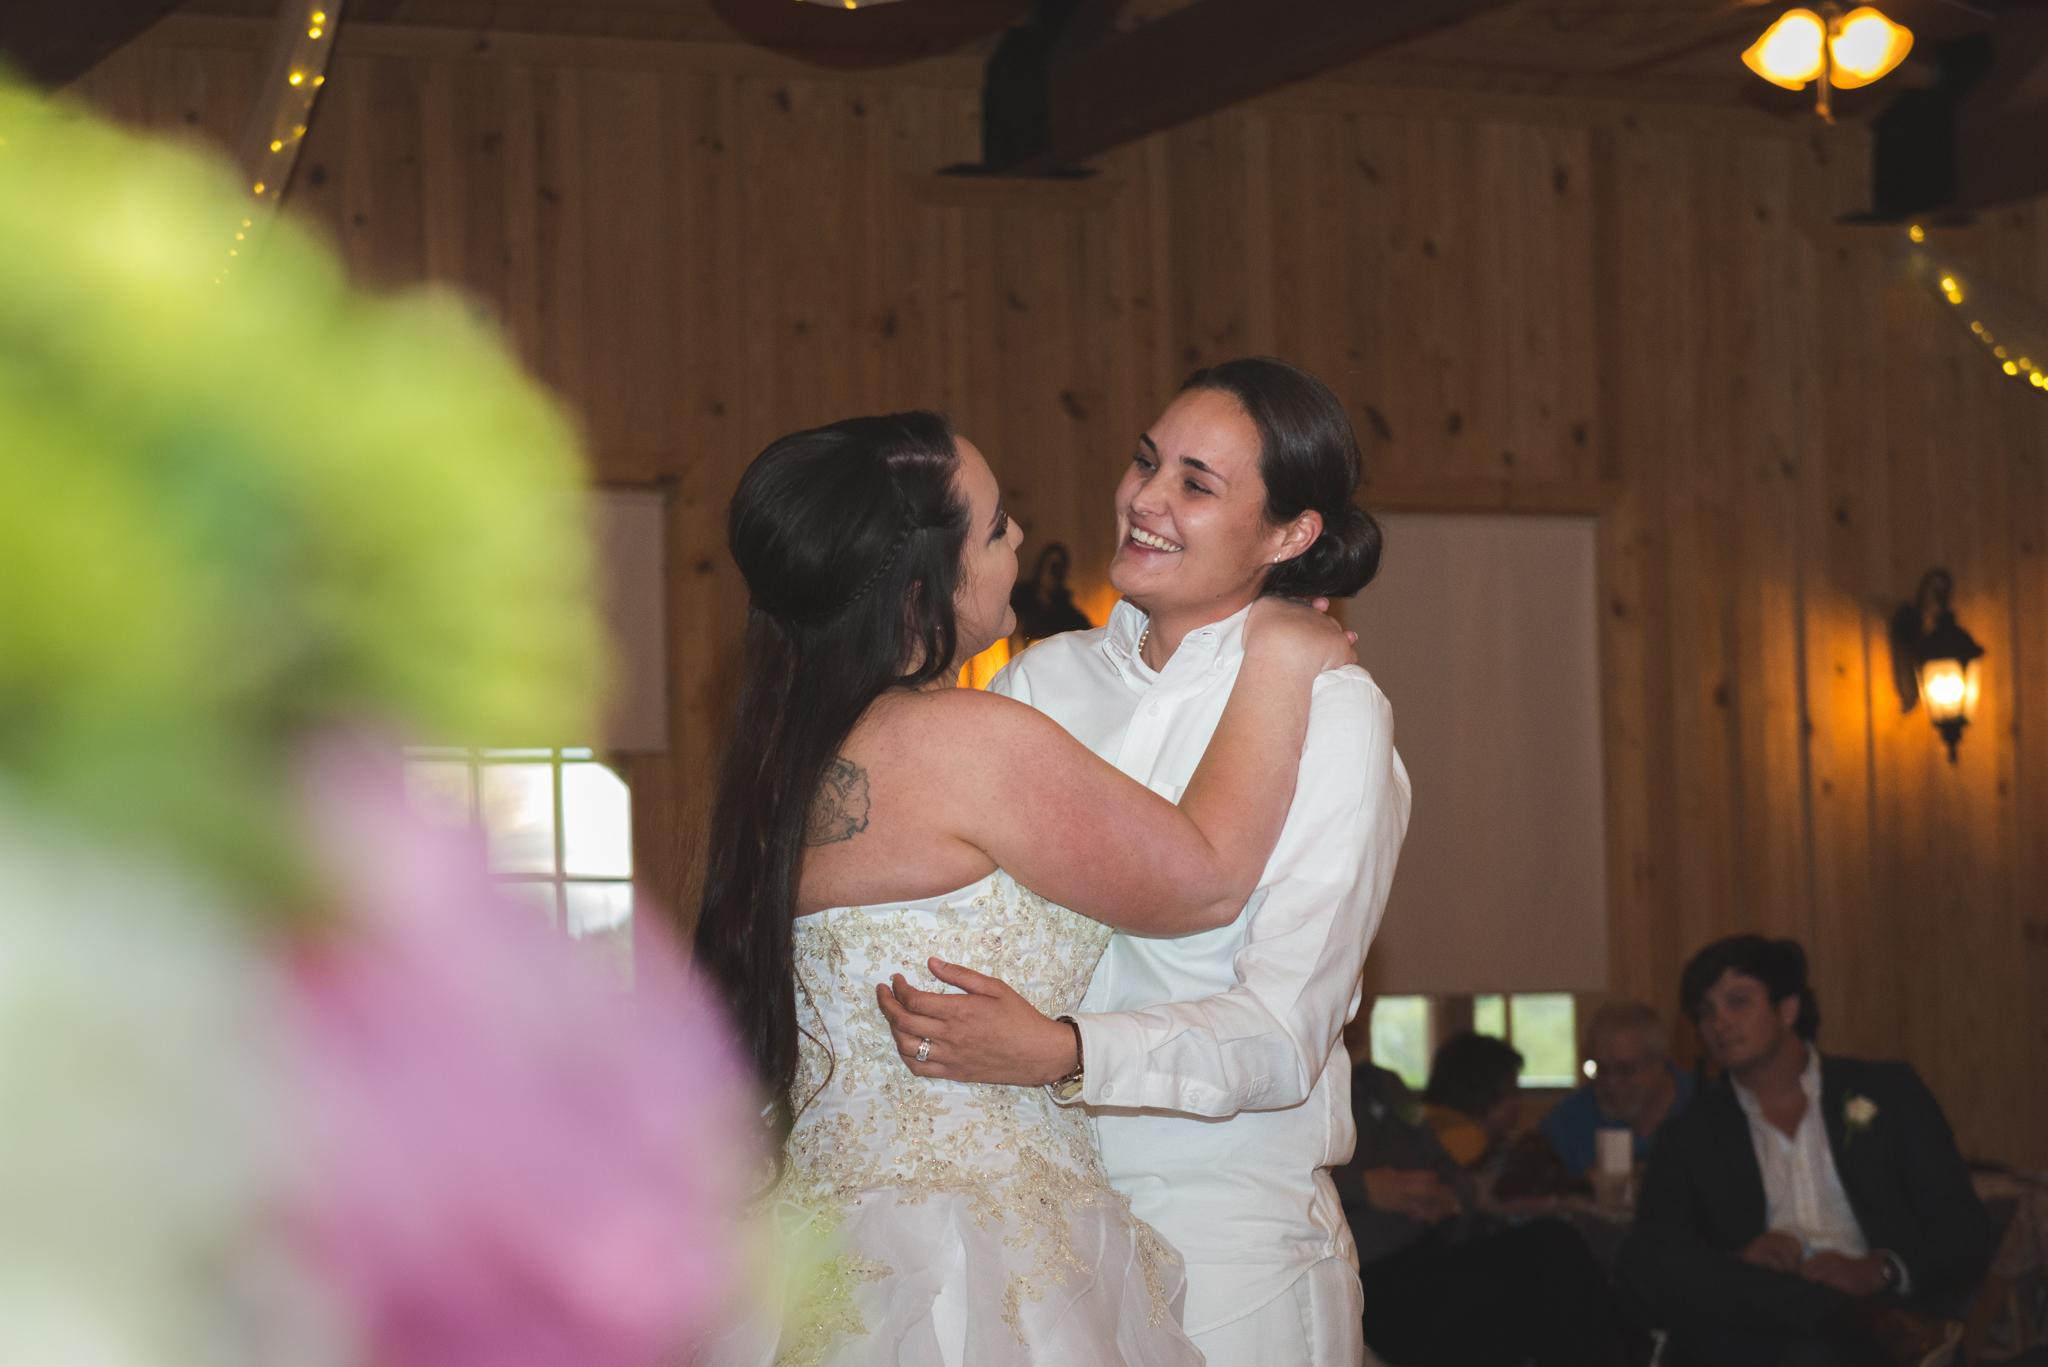 Tiffanie and Kaylyn's first dance